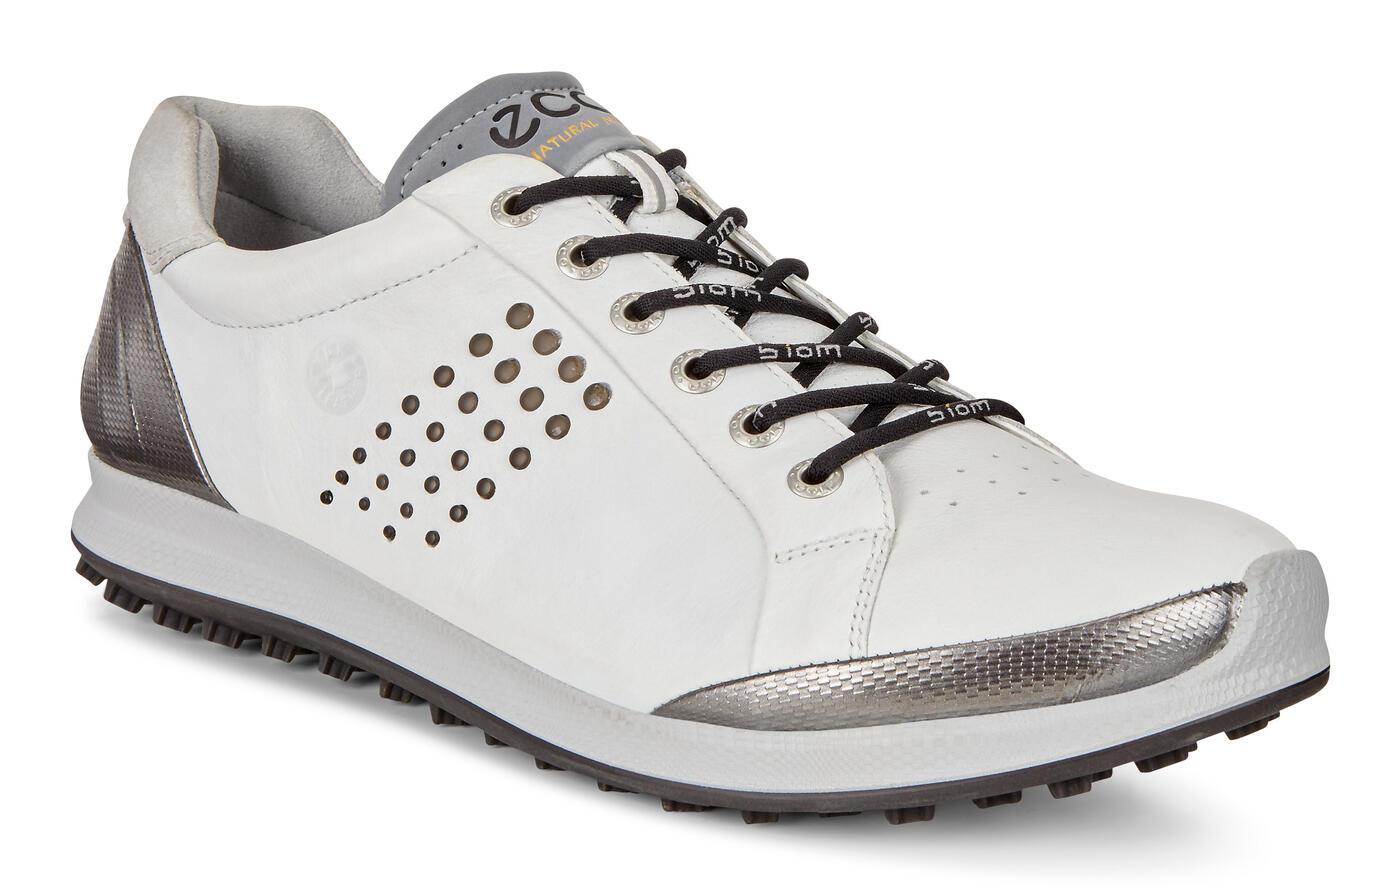 ECCO Mens Golf Biom Hybrid 2